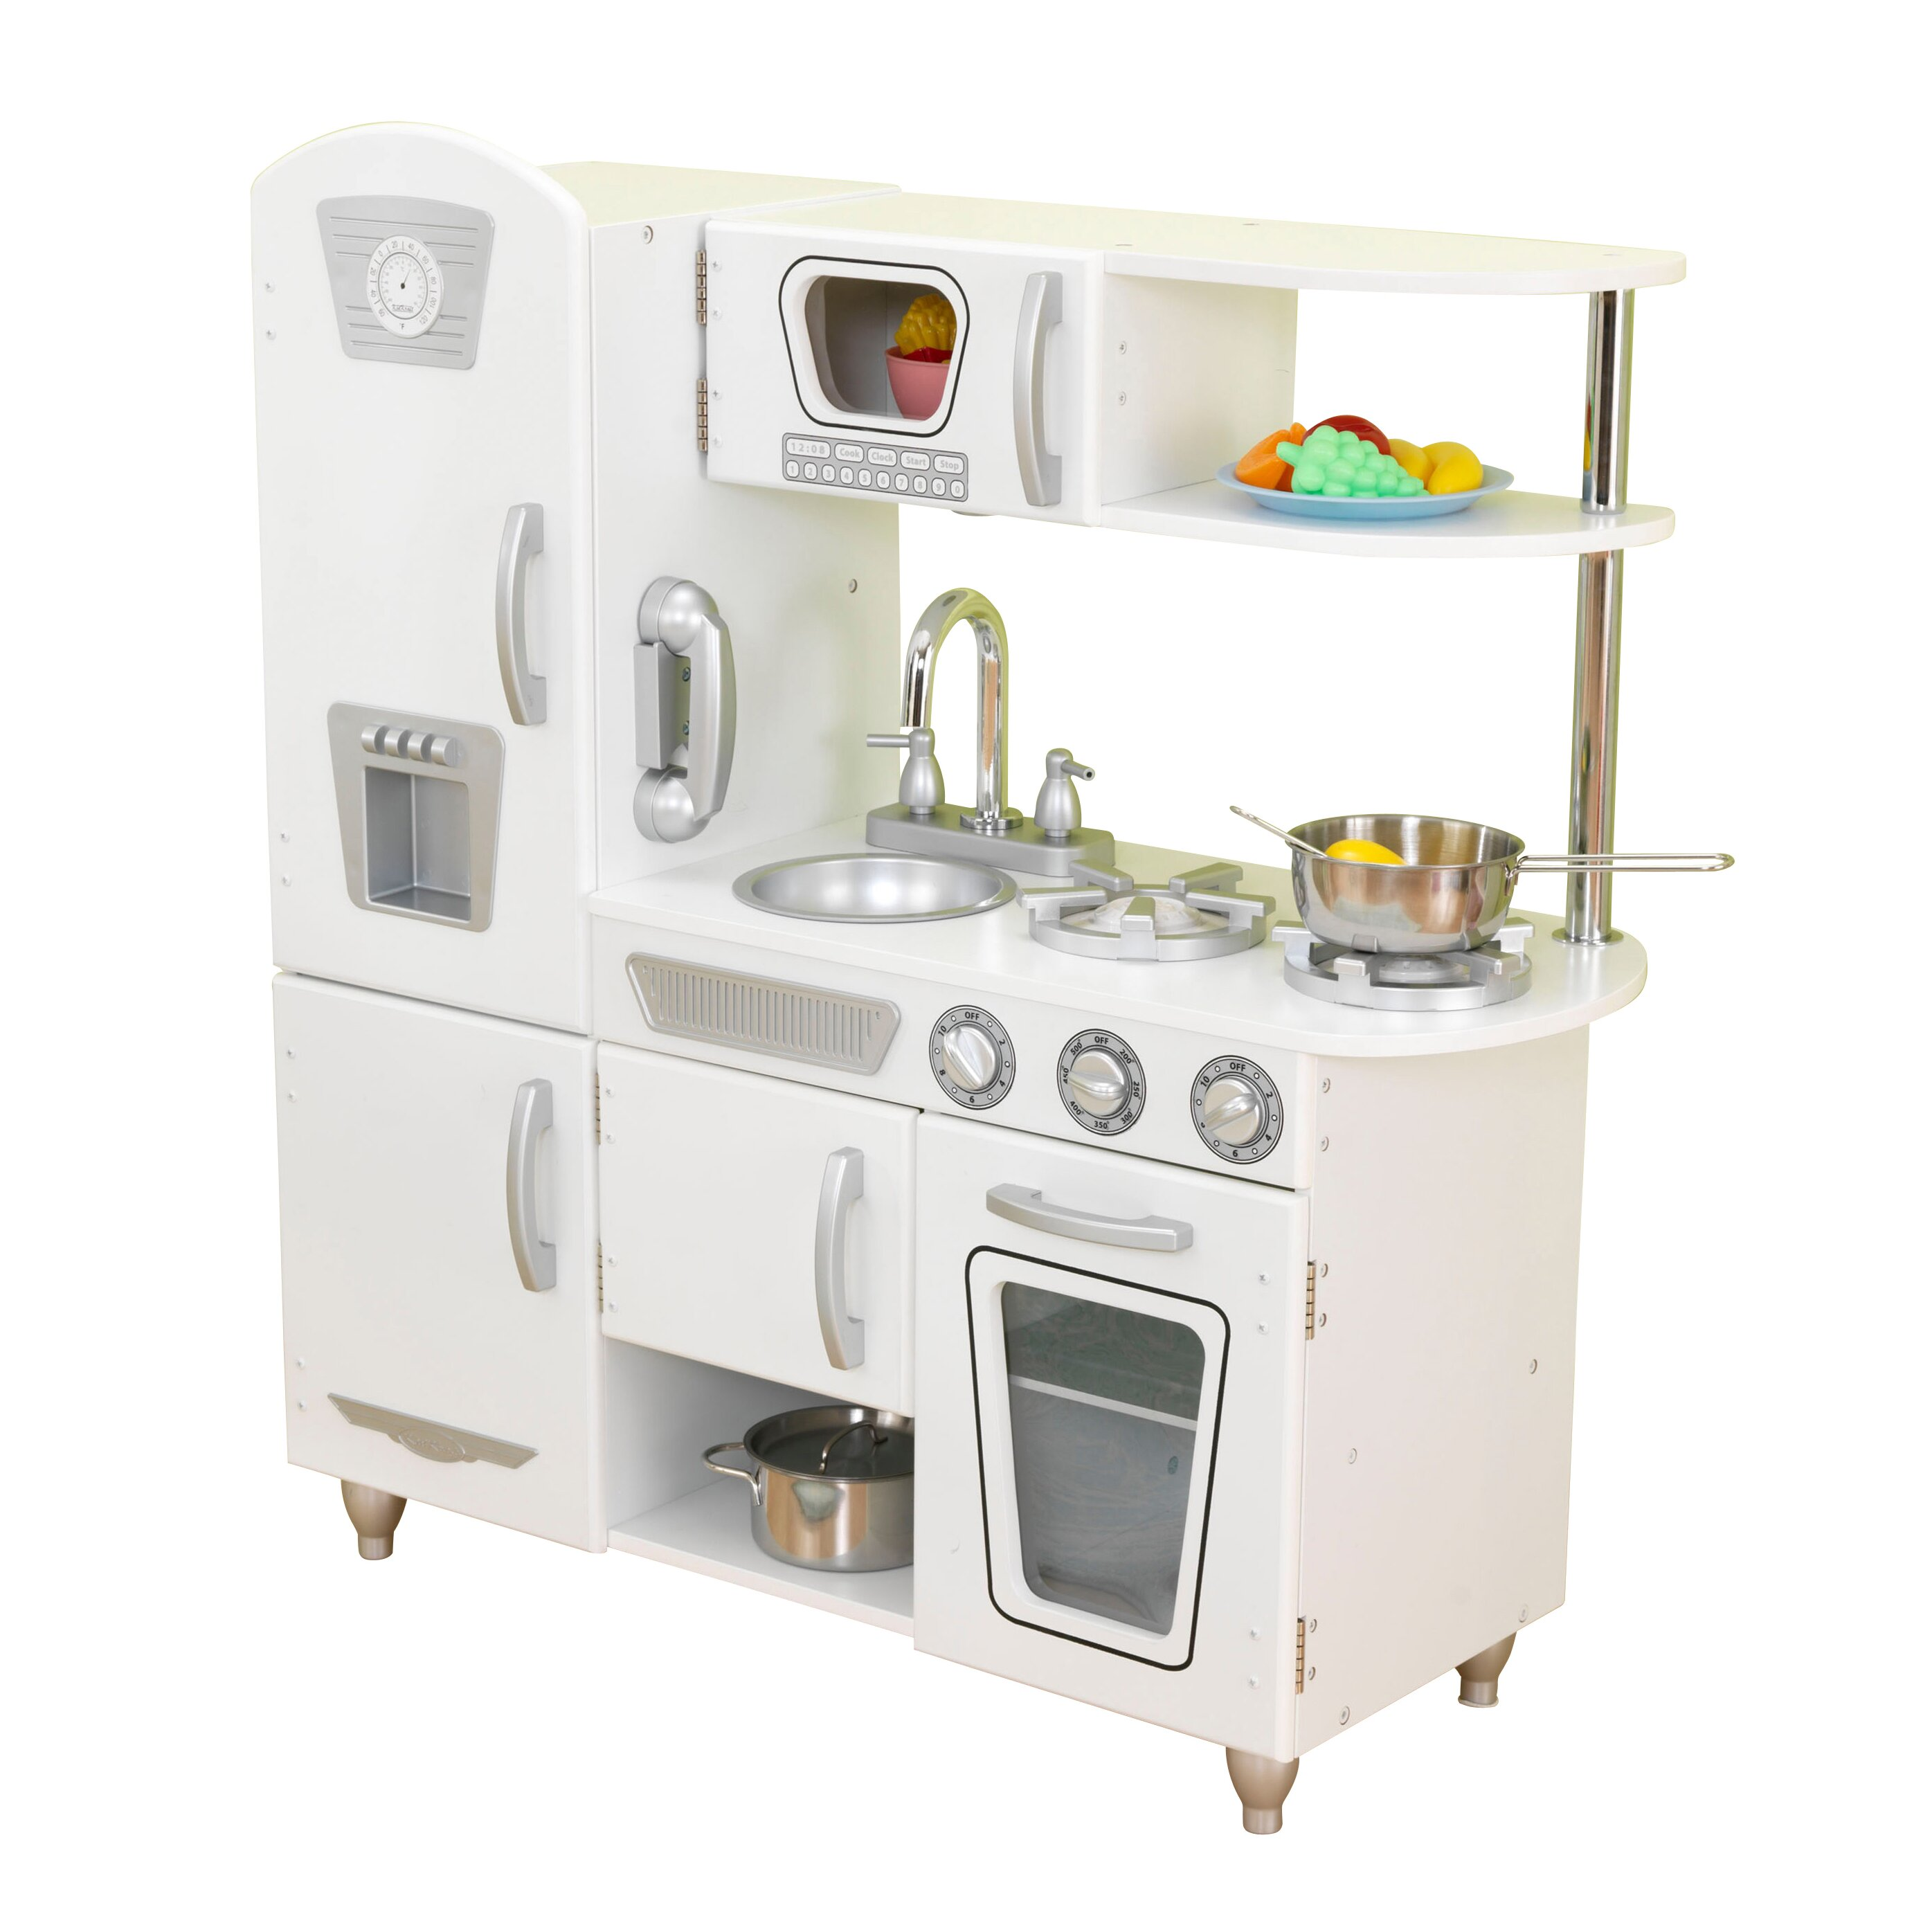 Kidkraft Vintage Kitchen In Blue 53227: KidKraft Vintage Kitchen & Reviews